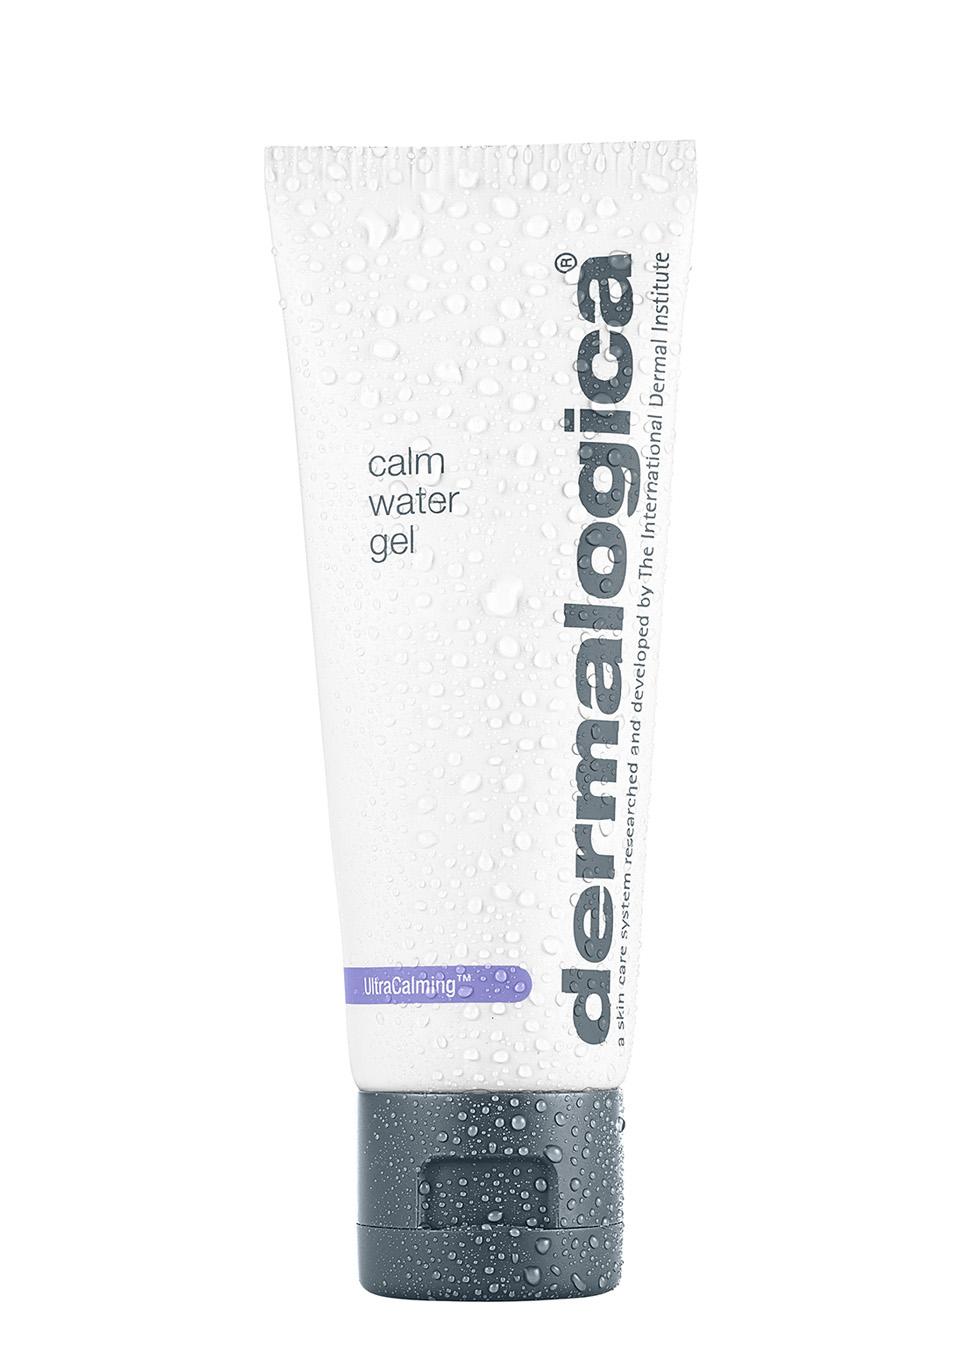 Calm Water Gel 50ml